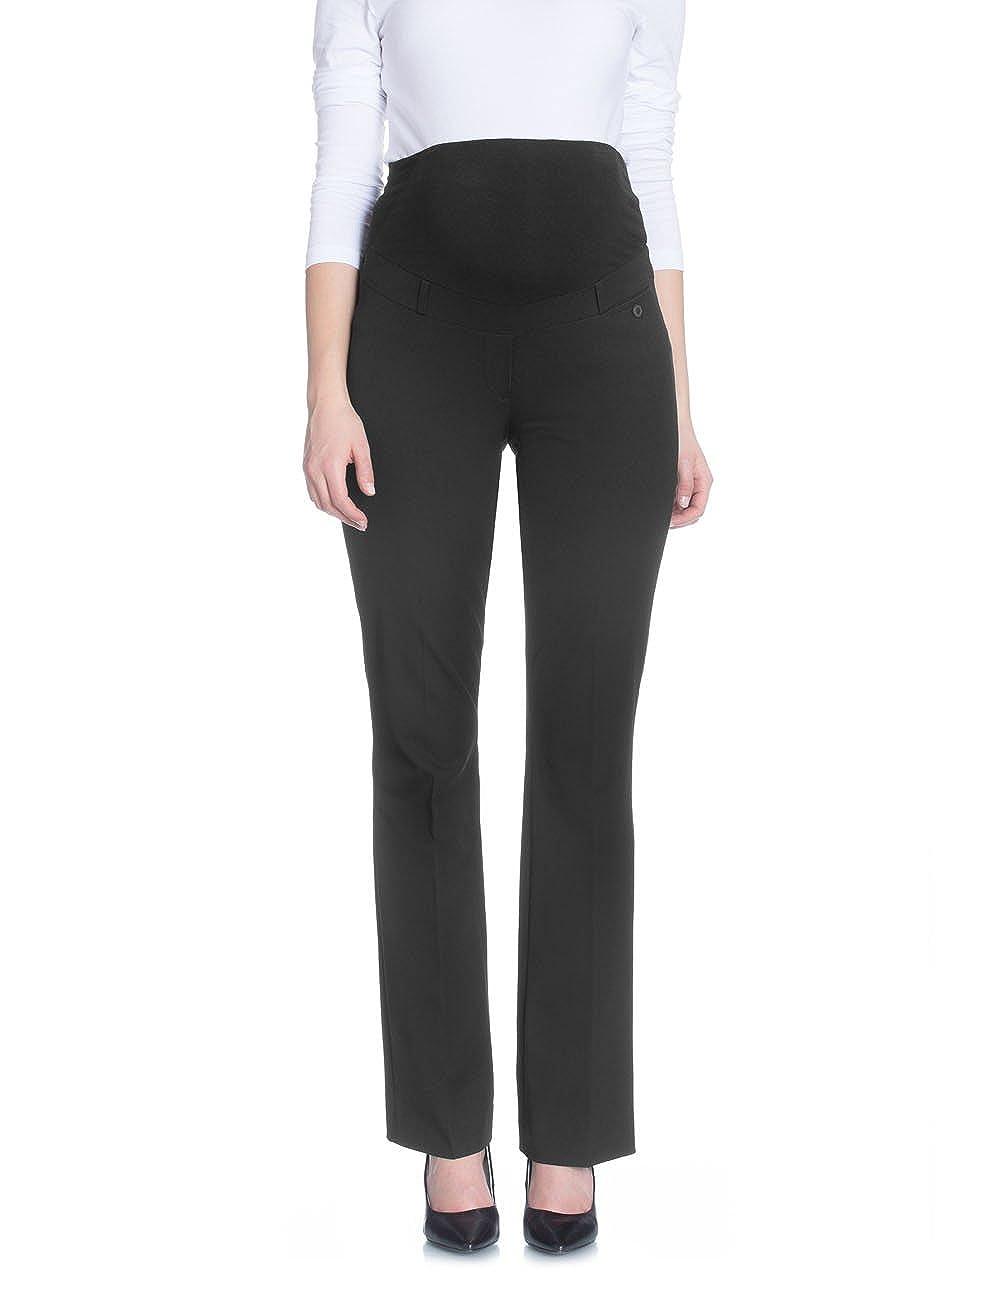 Bellybutton - 1969-00-90000 - Pantalon Élégant - Femme